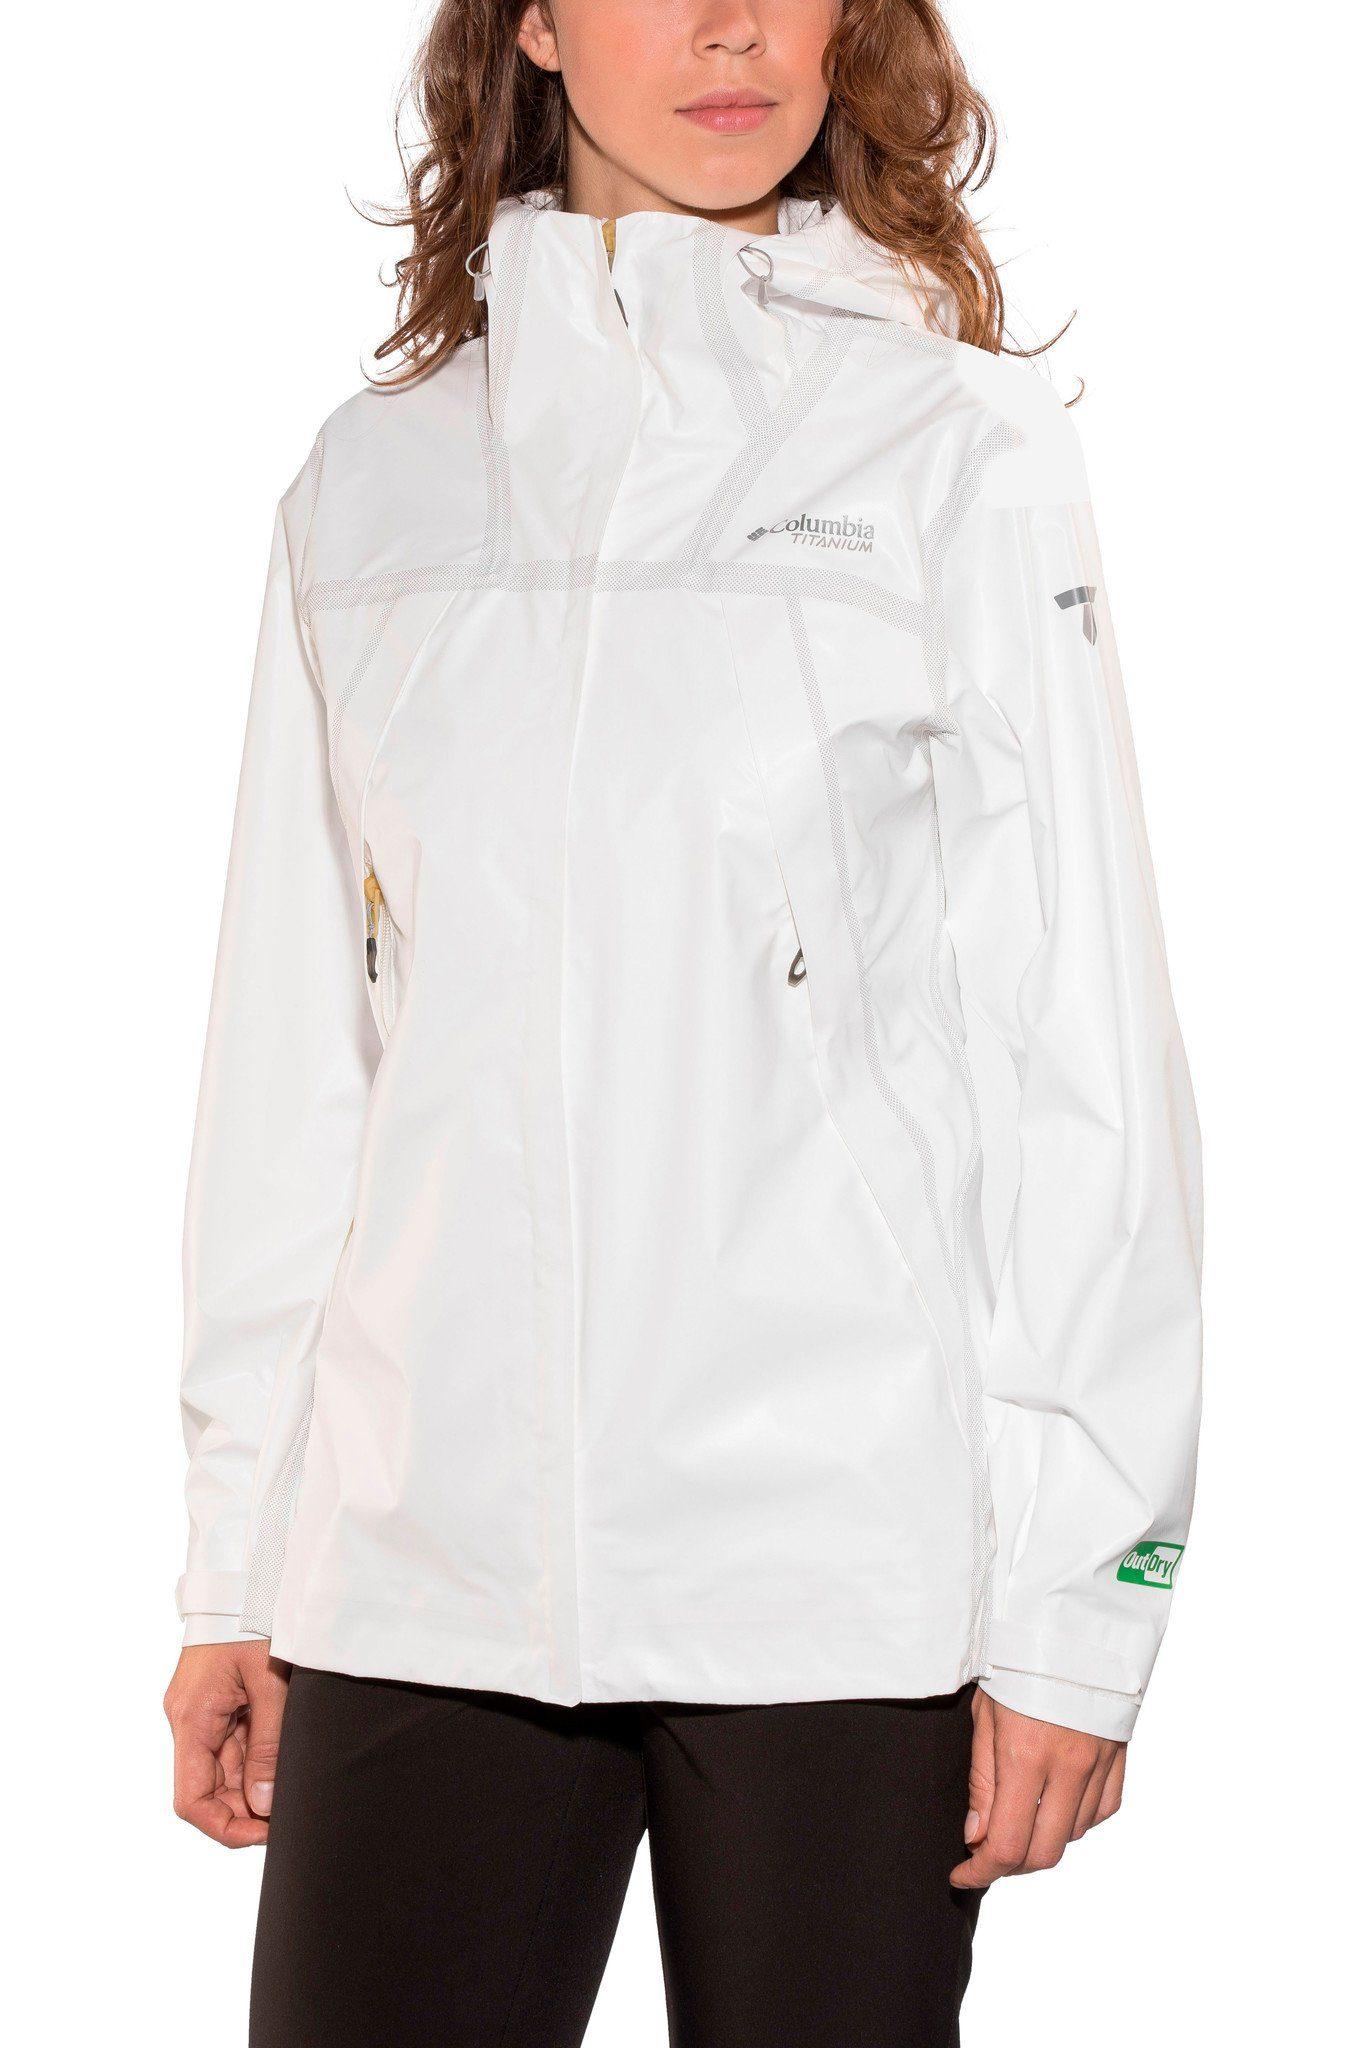 Columbia Outdoorjacke »Outdry Ex ECO Tech Shell Jacket Women«